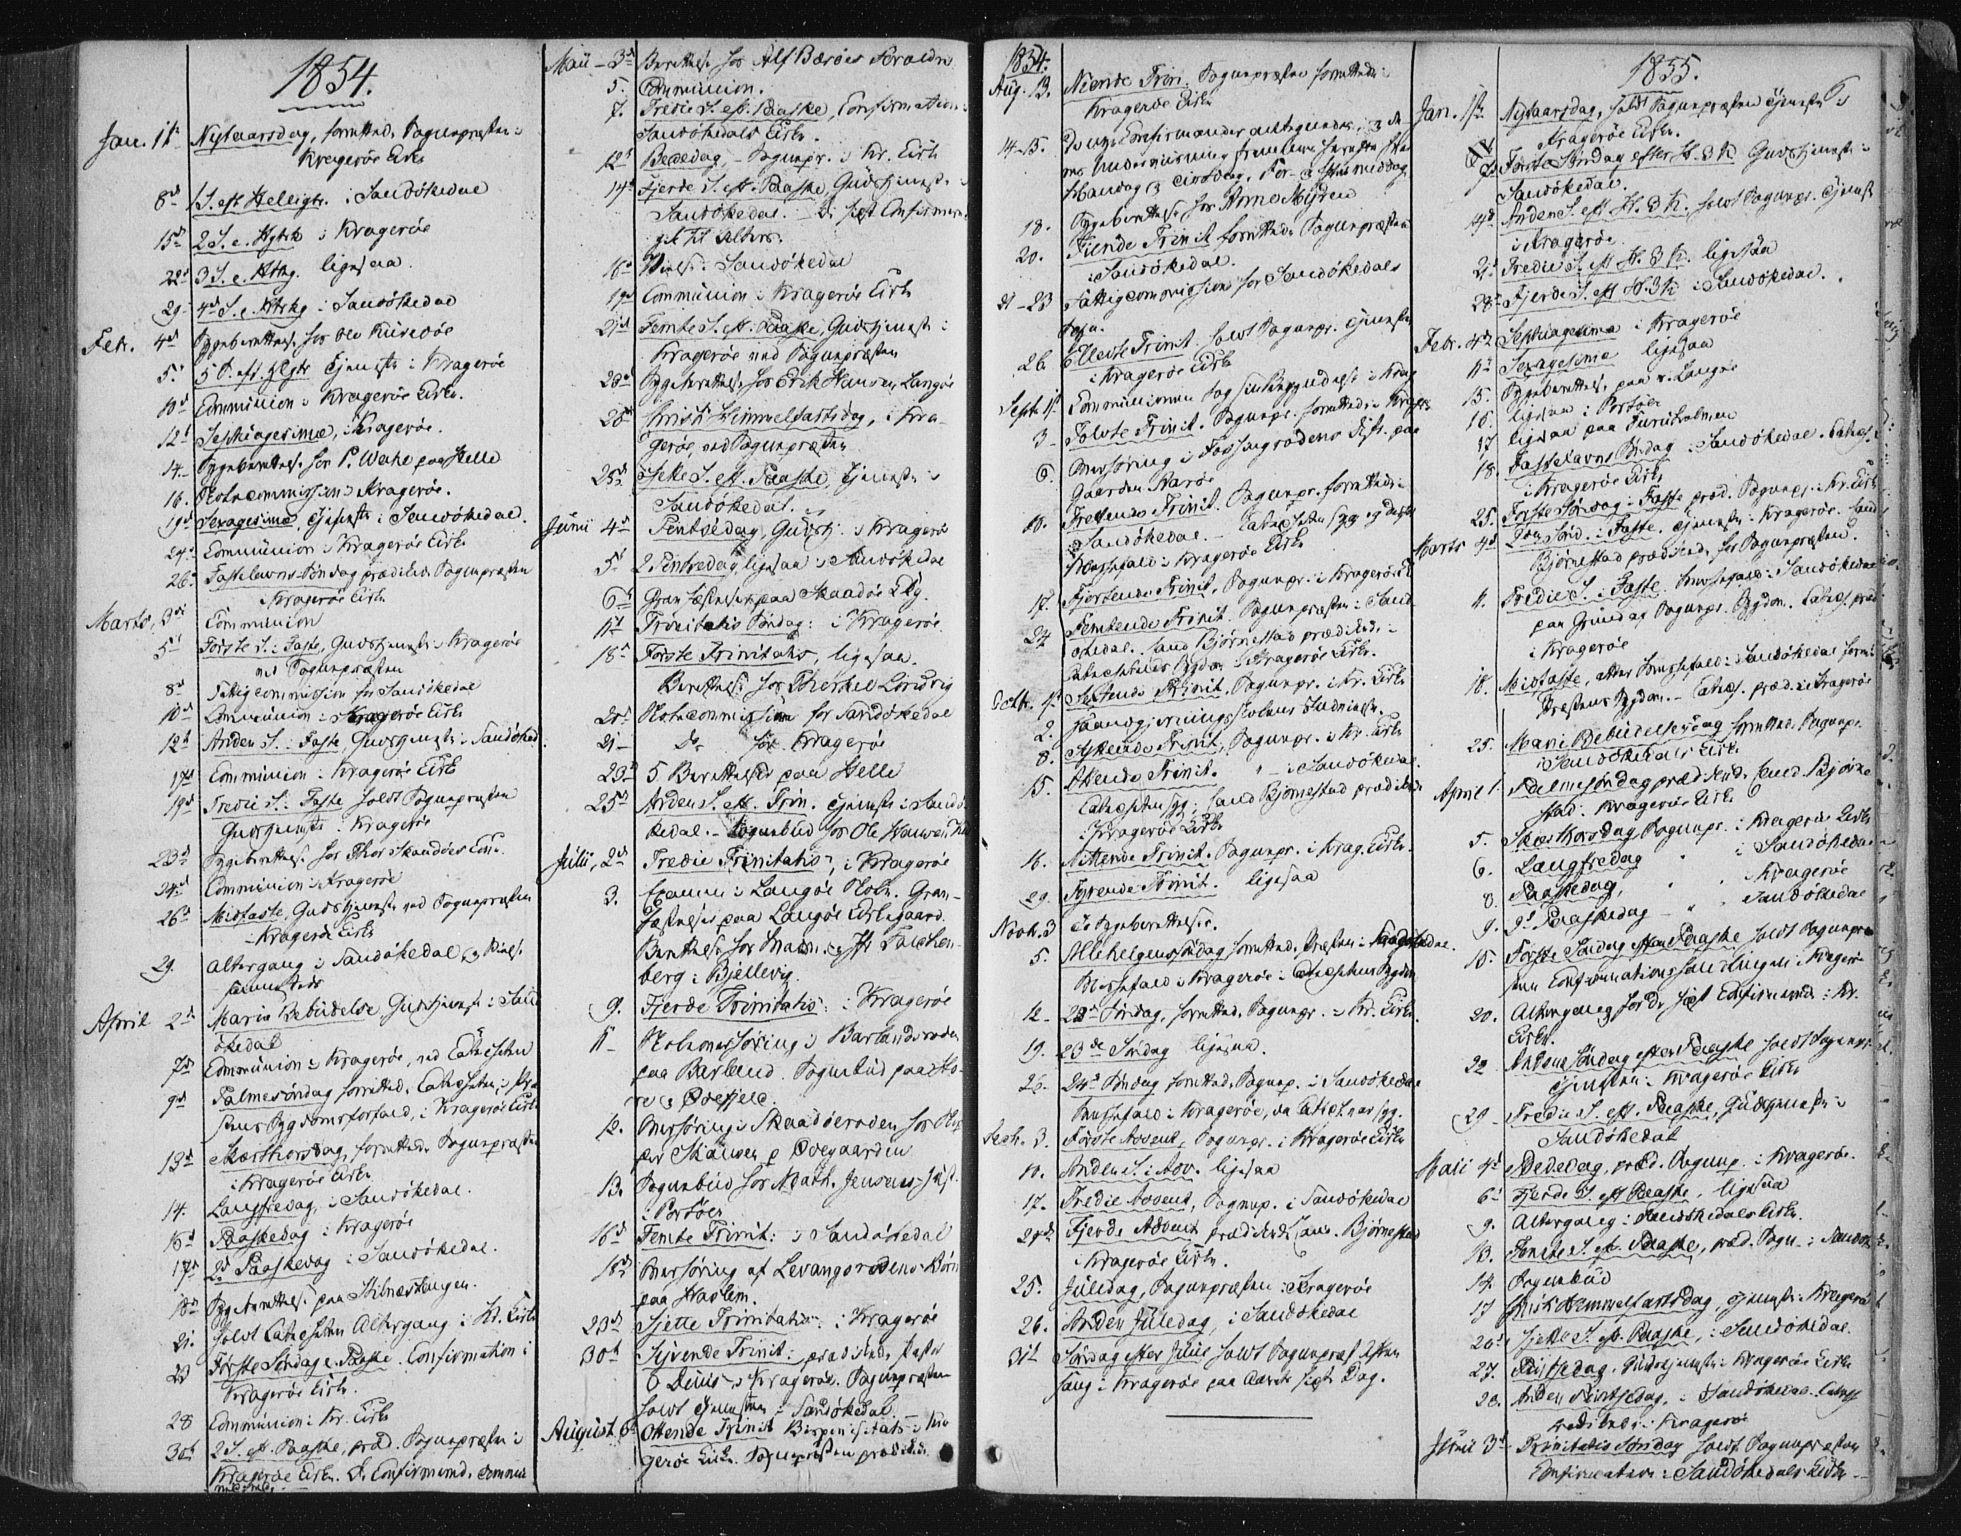 SAKO, Kragerø kirkebøker, F/Fa/L0006: Ministerialbok nr. 6, 1847-1861, s. 6